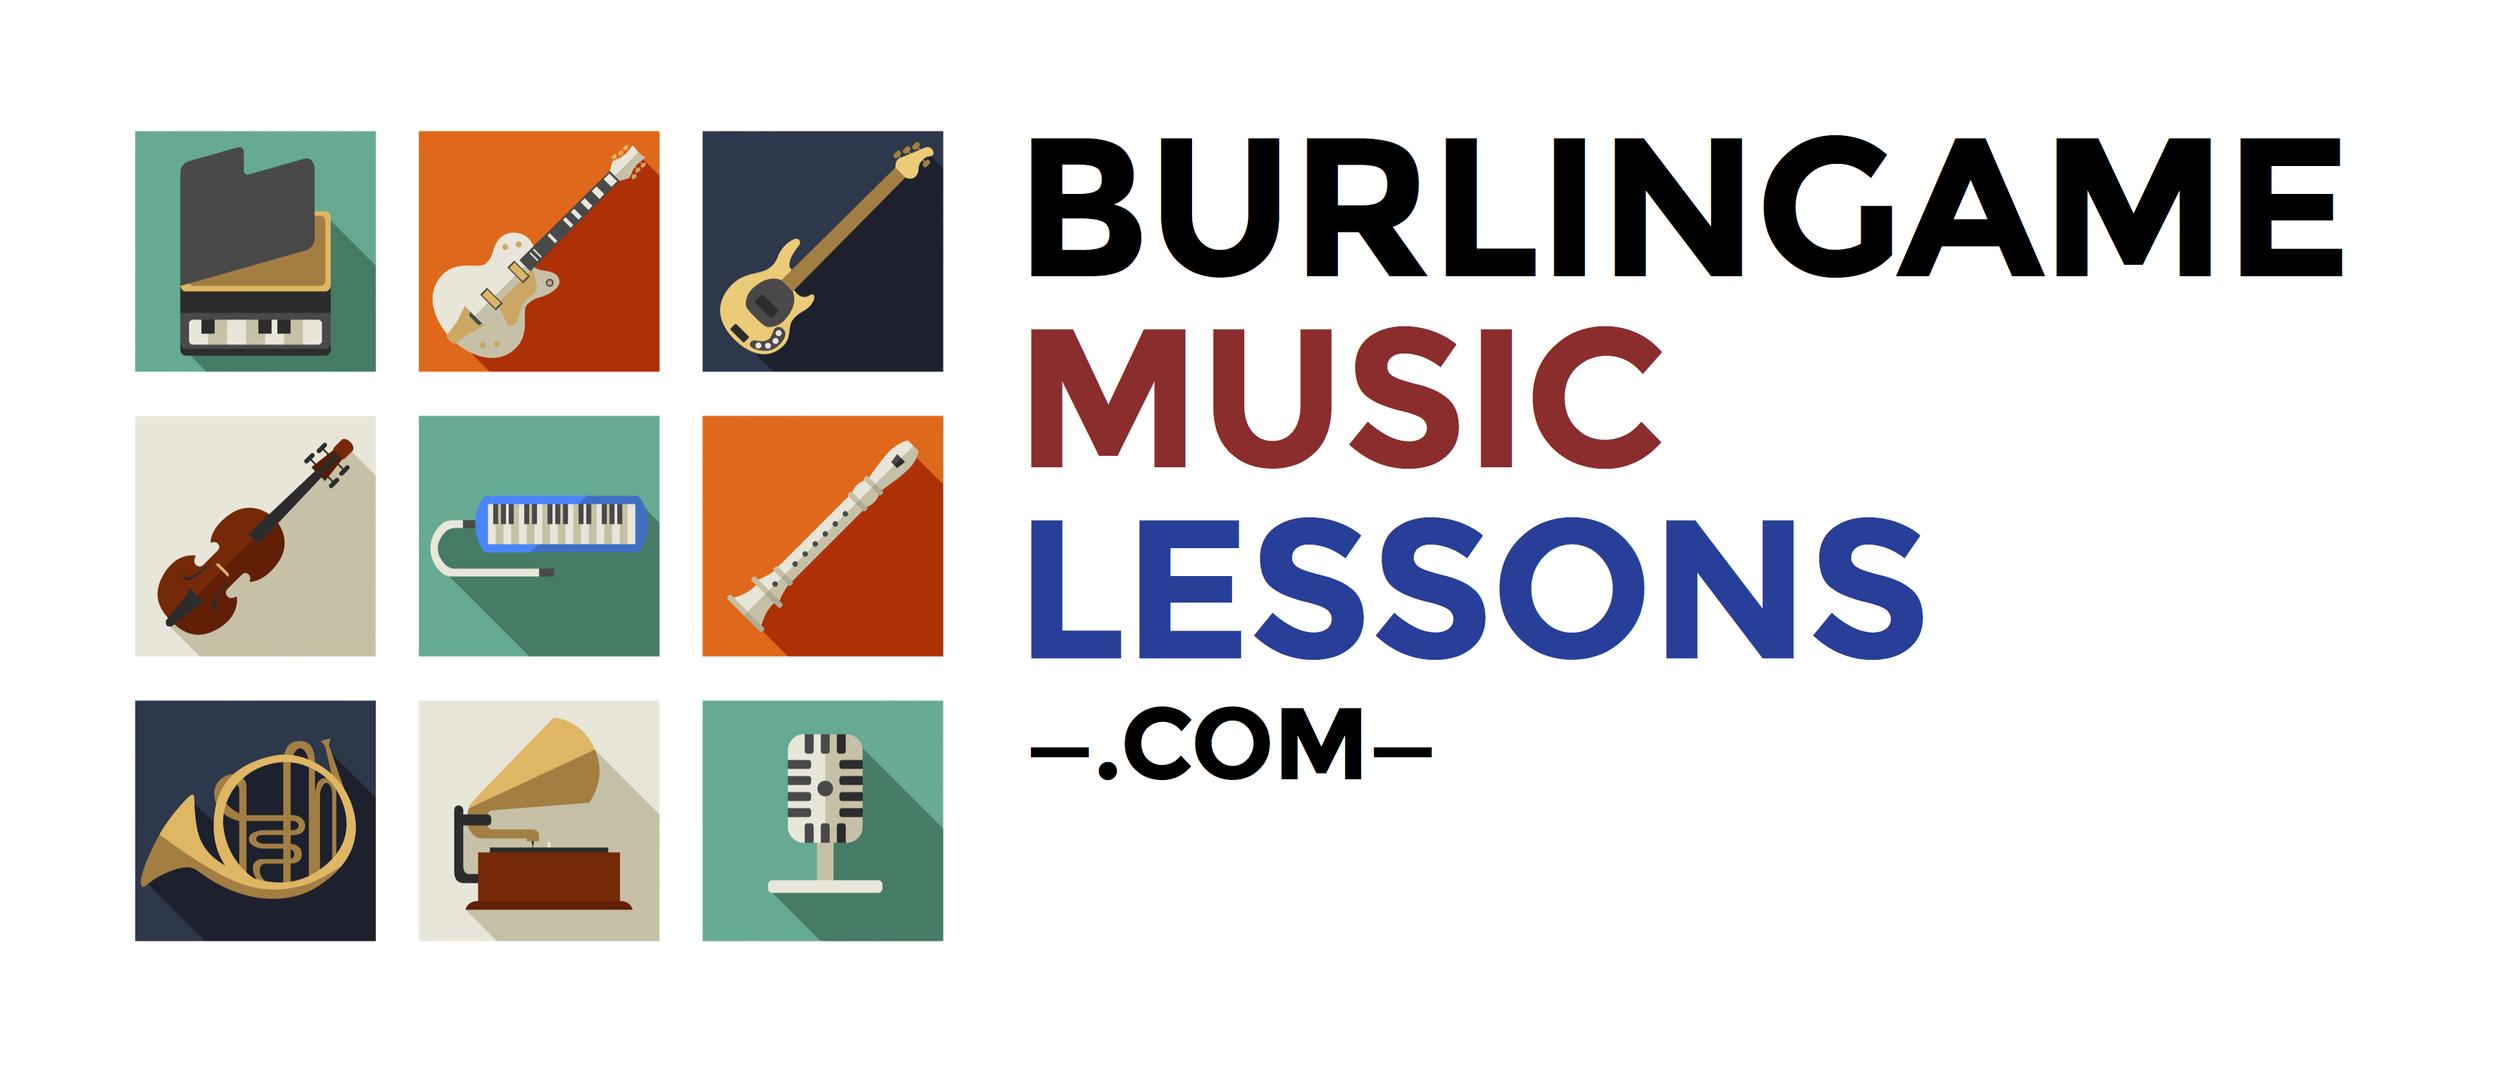 Burlingame Music Lessons